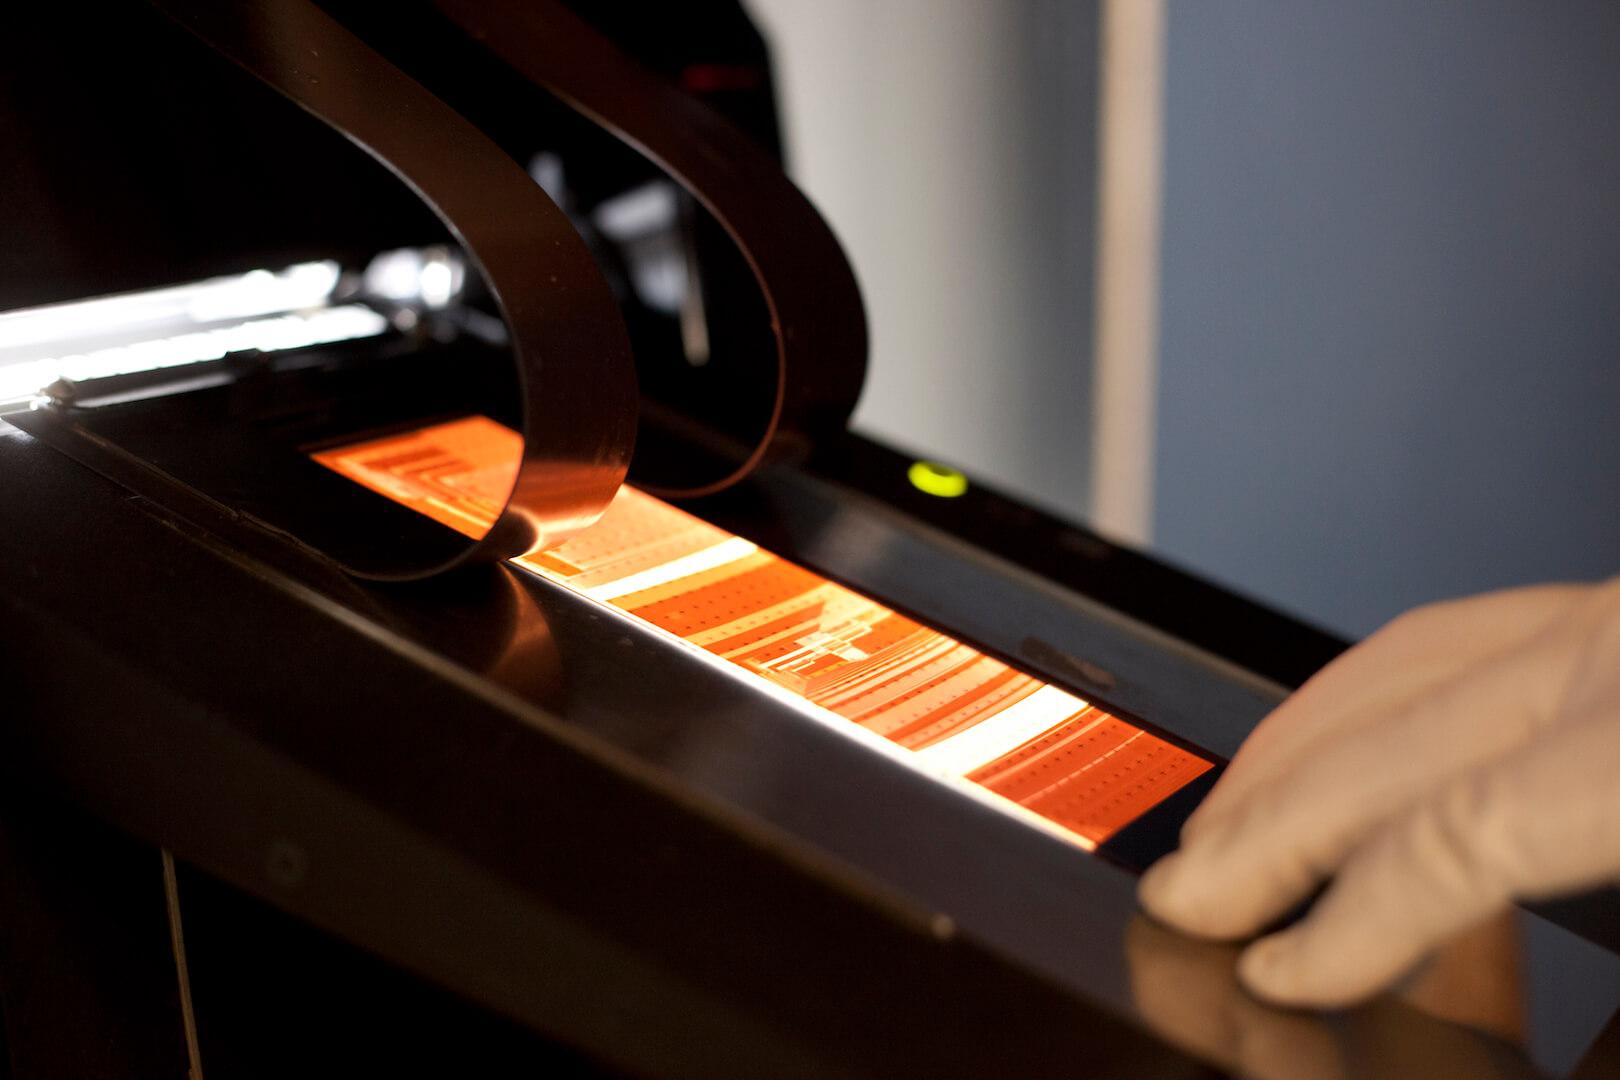 Imacon Flextight Virtual Drum Scanner